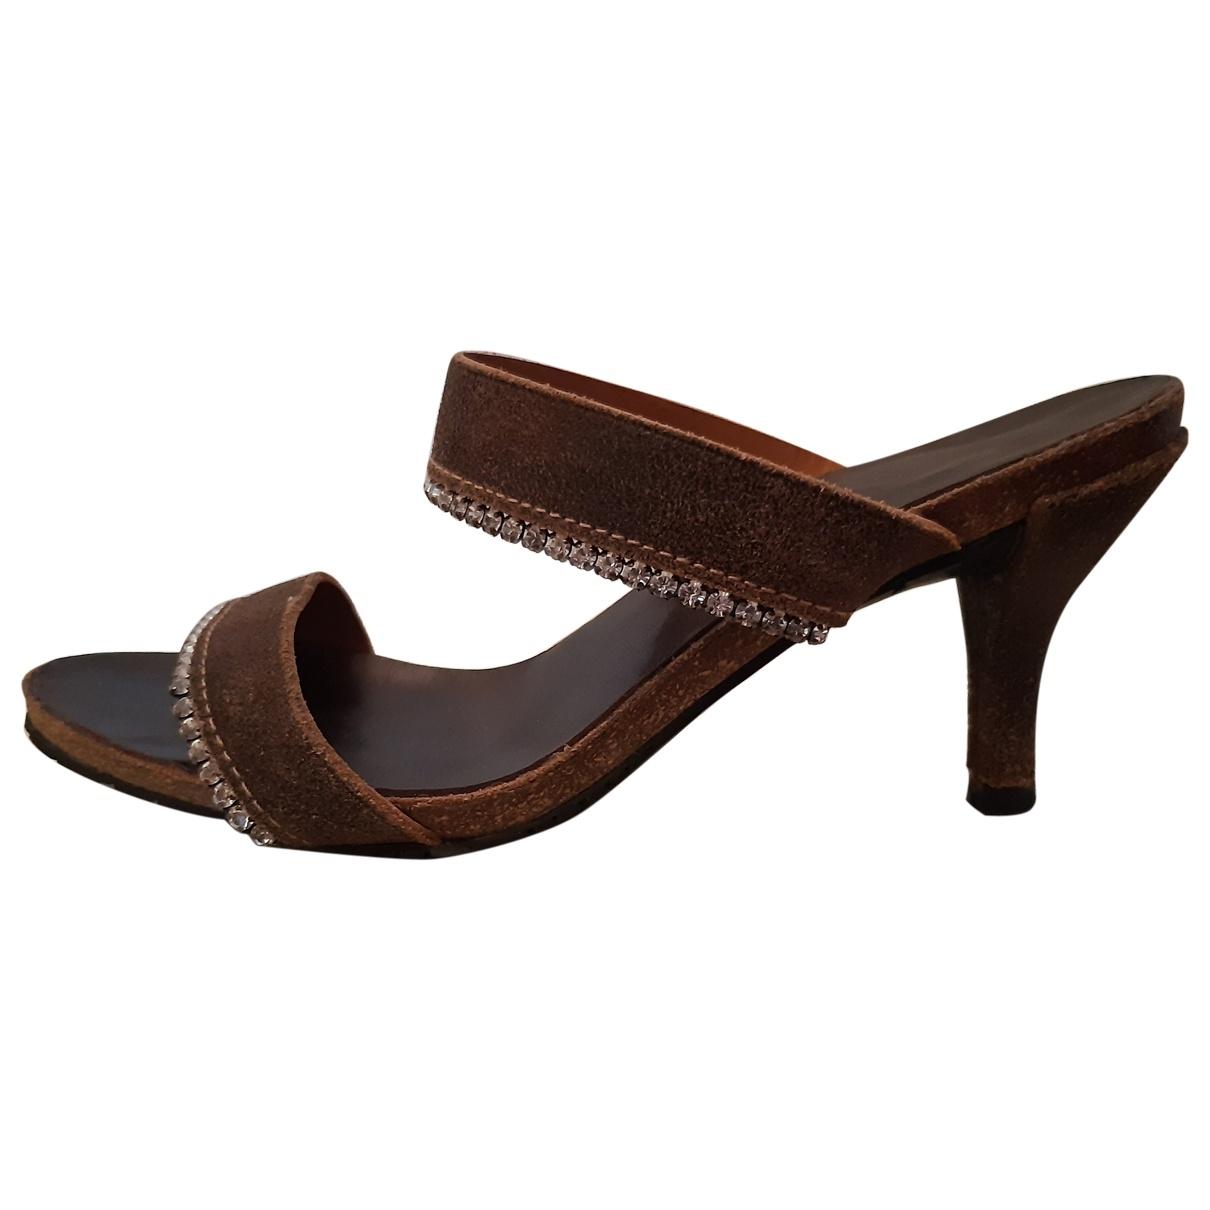 Pedro Garcia \N Brown Leather Sandals for Women 36 EU